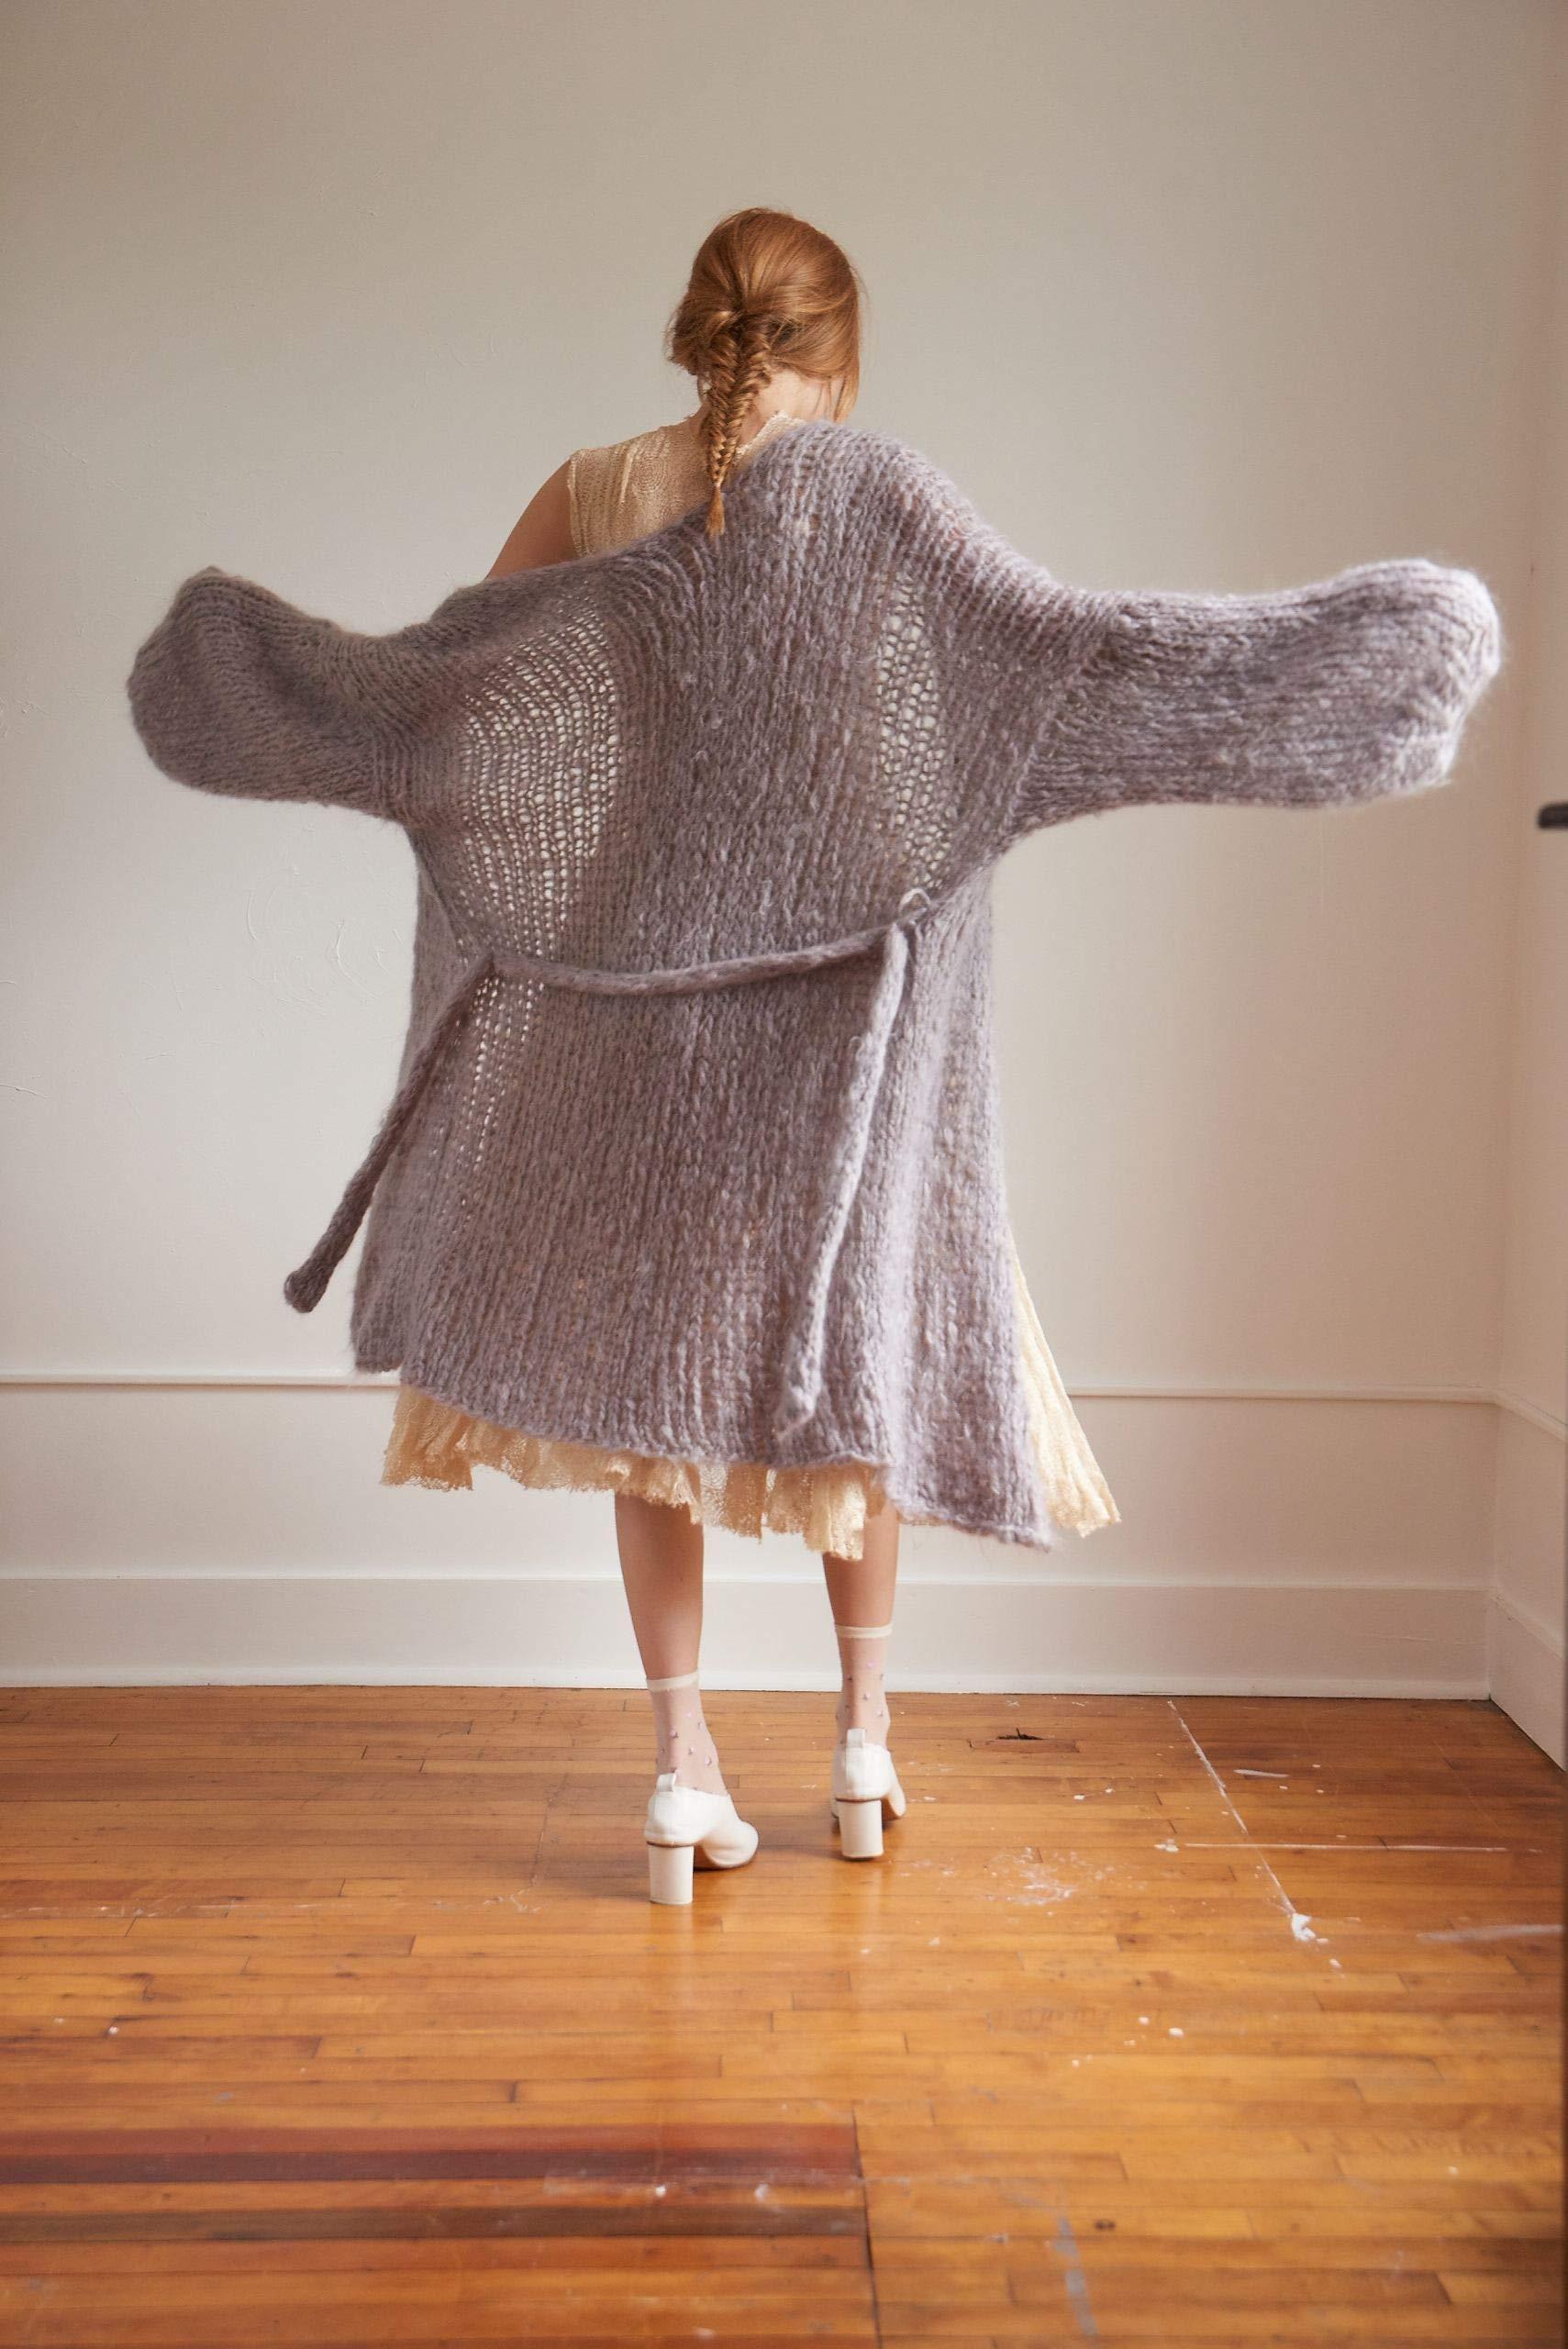 Loopy Mango DIY Knit Kit - Medium/Large Long Cardigan - Mohair So Soft (Moss) by Loopy Mango (Image #4)